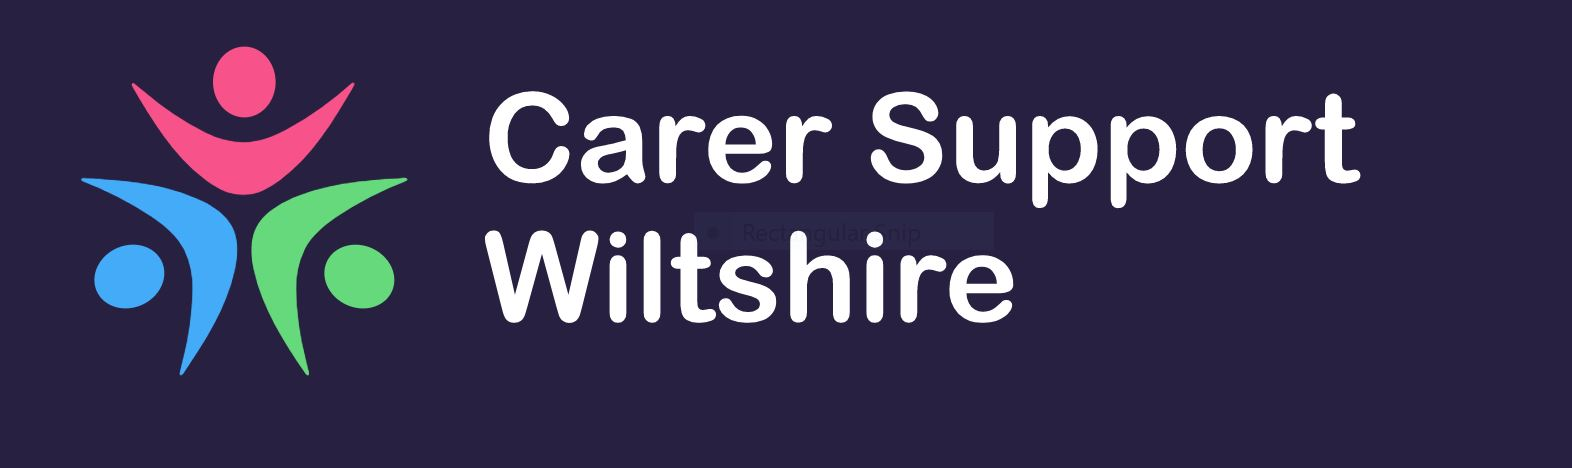 Carer Support Wiltshire logo